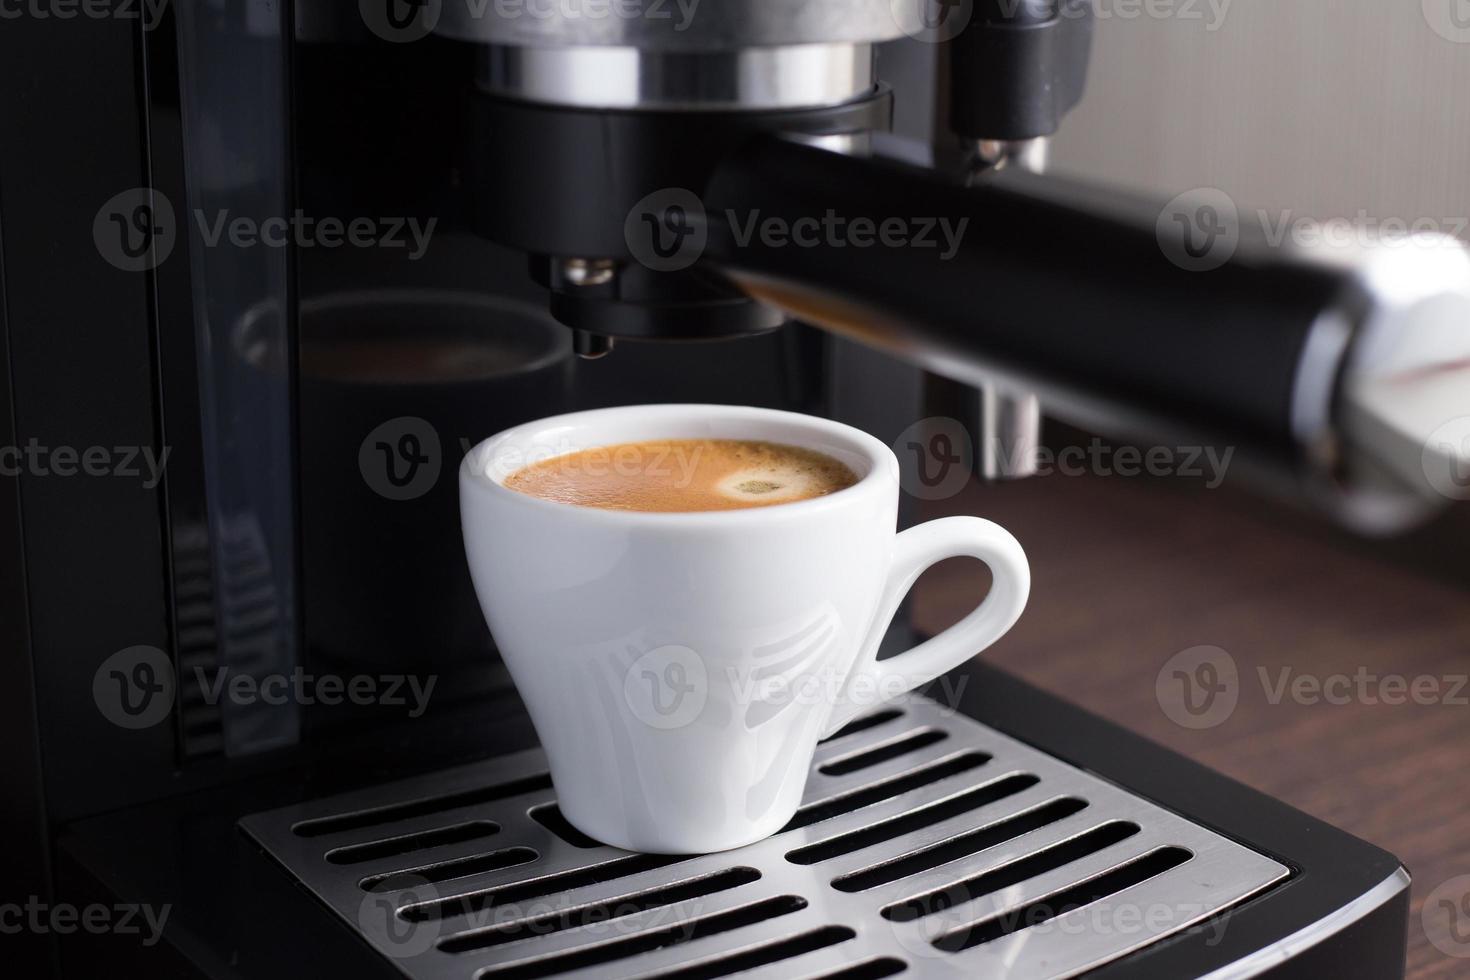 inhemsk kaffemaskin gör espresso foto